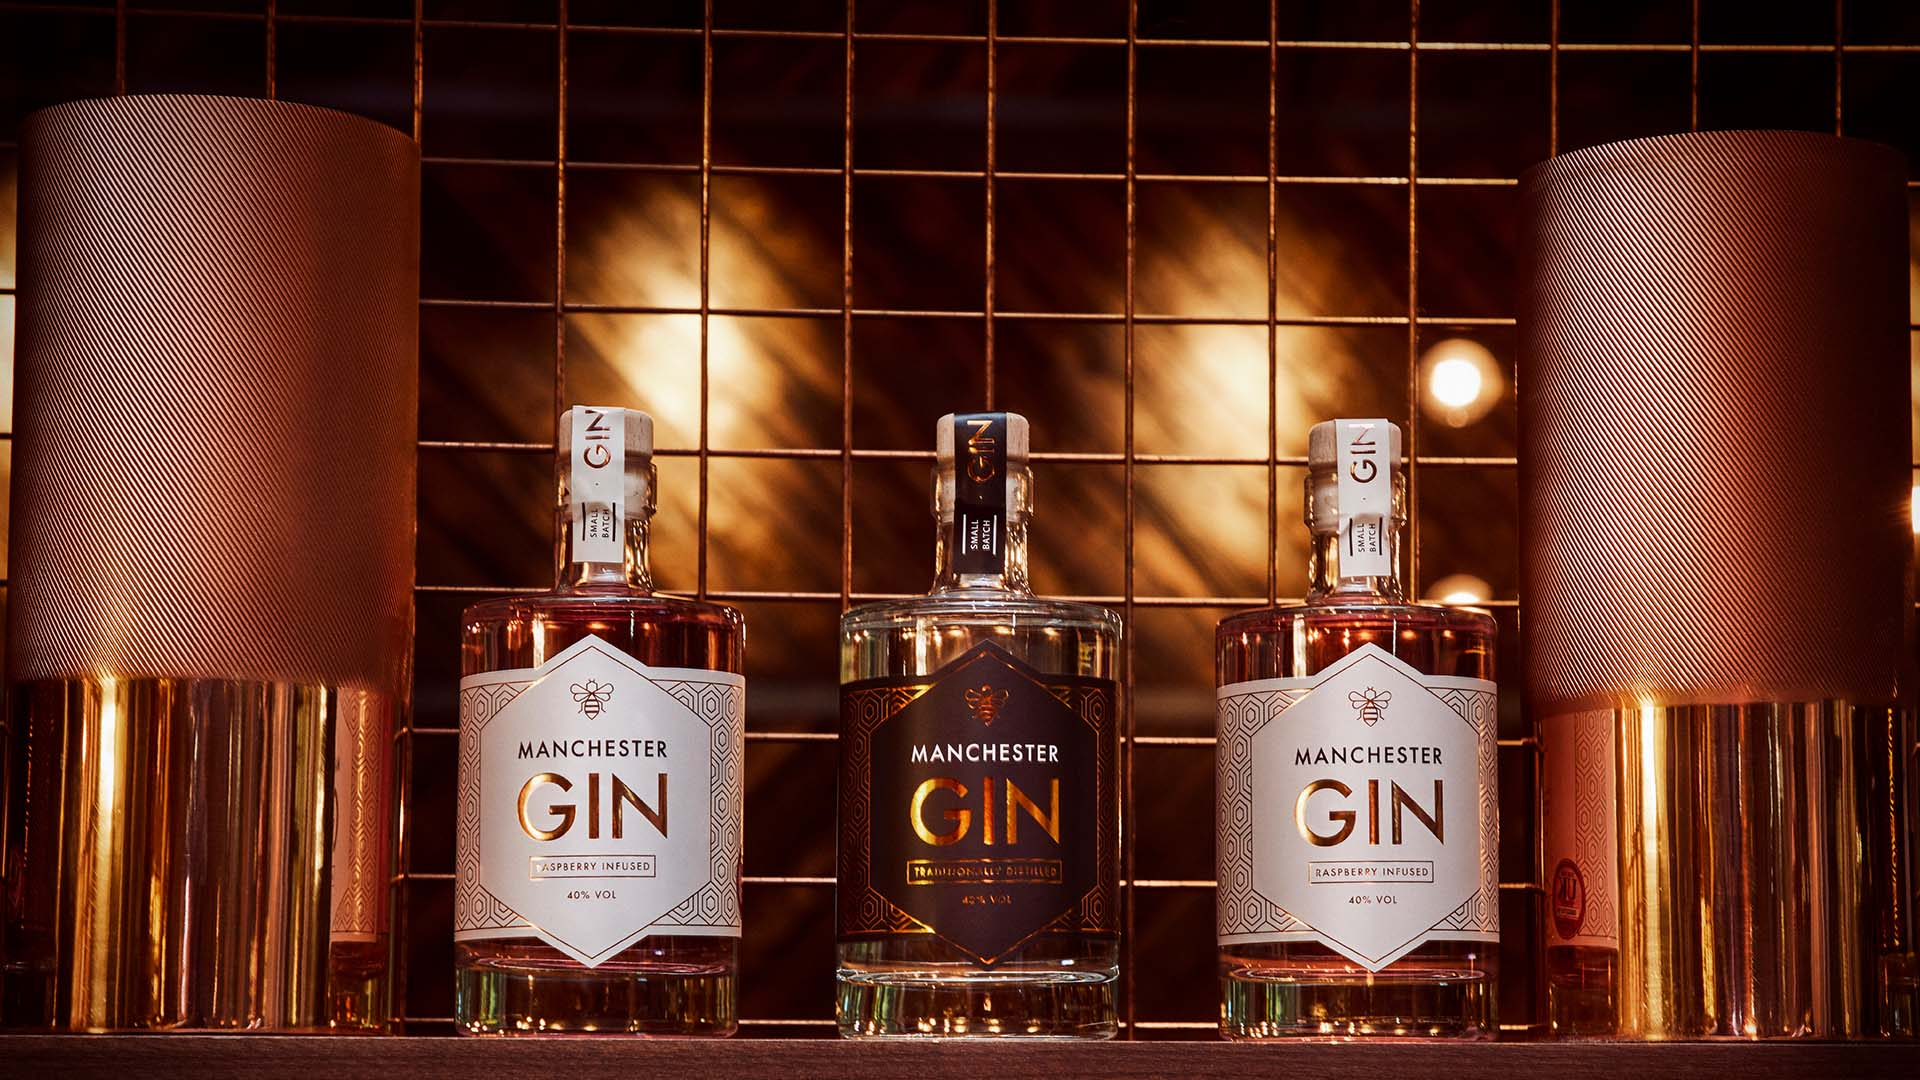 Manchester-Gin-Made-in-Manchester-rose-original.jpg